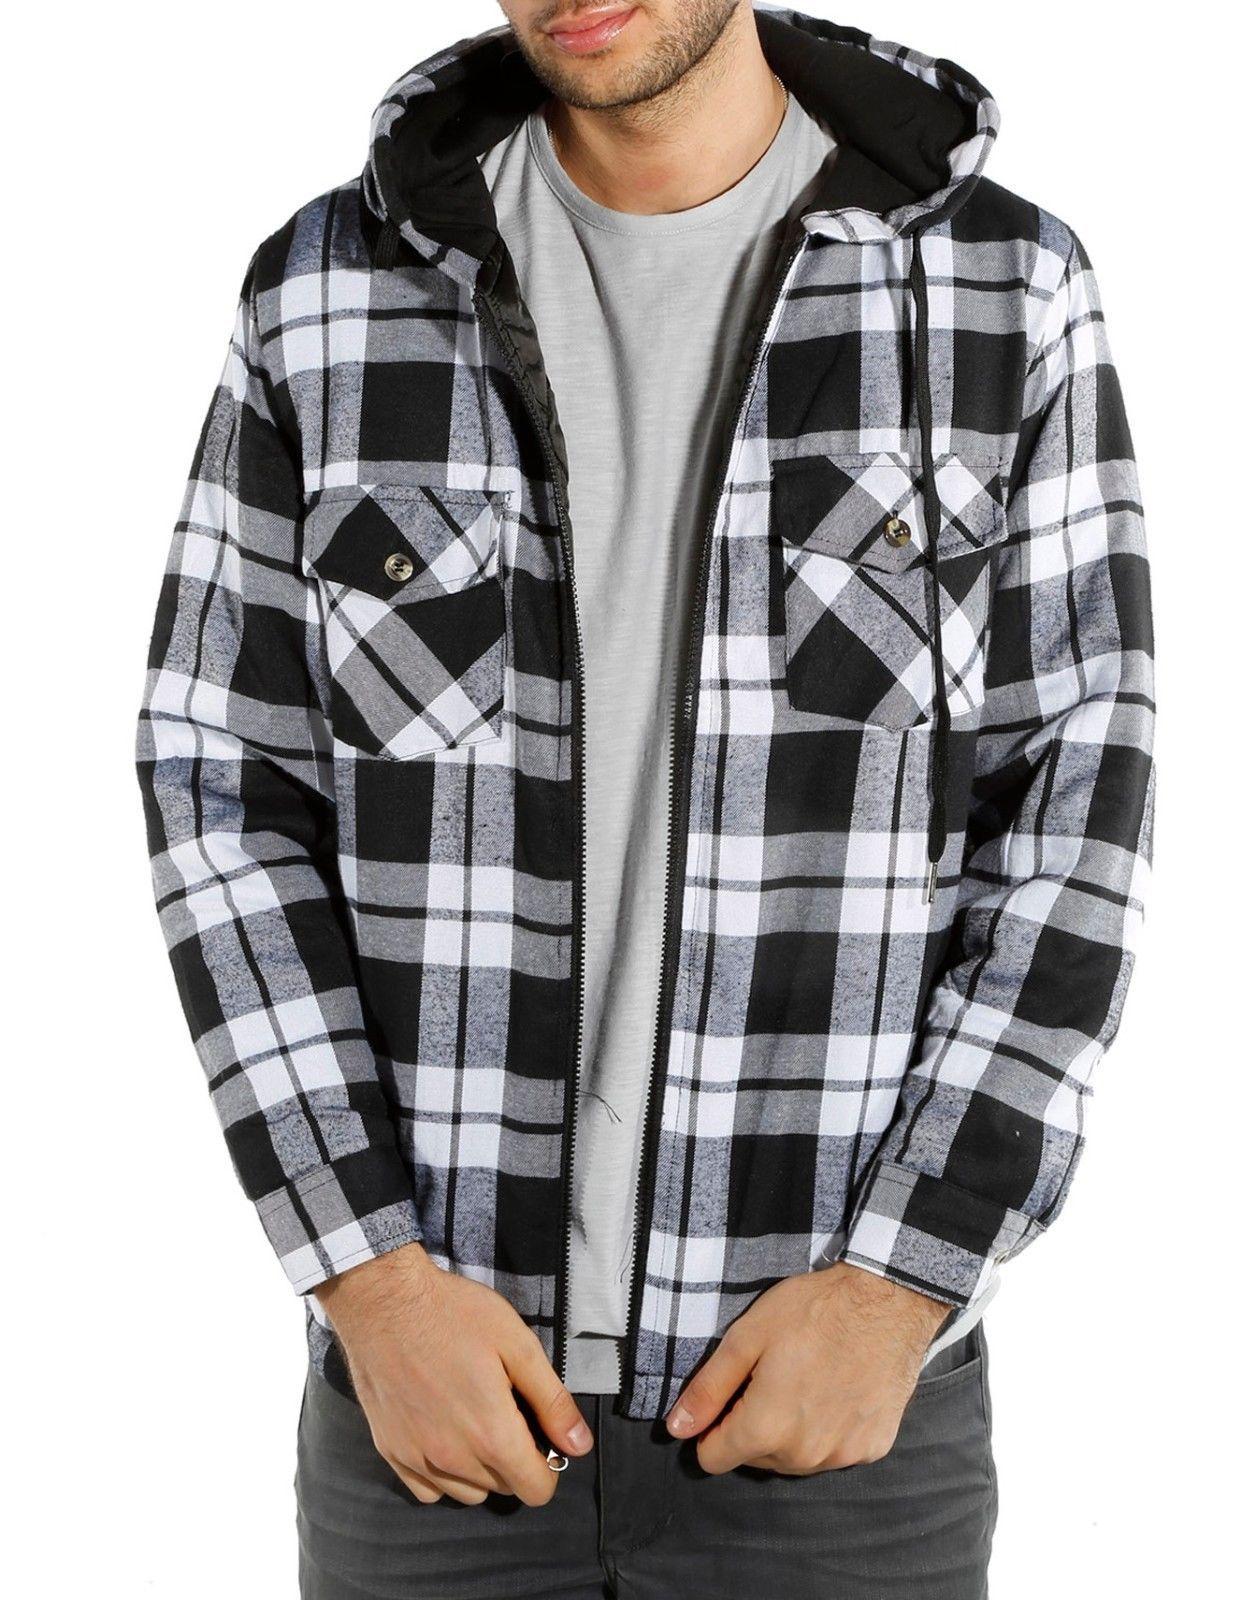 Flannel shirt under suit  Menus Quilted ZipUp Hooded Flannel Plaid Jacket Sweater Hoodie M